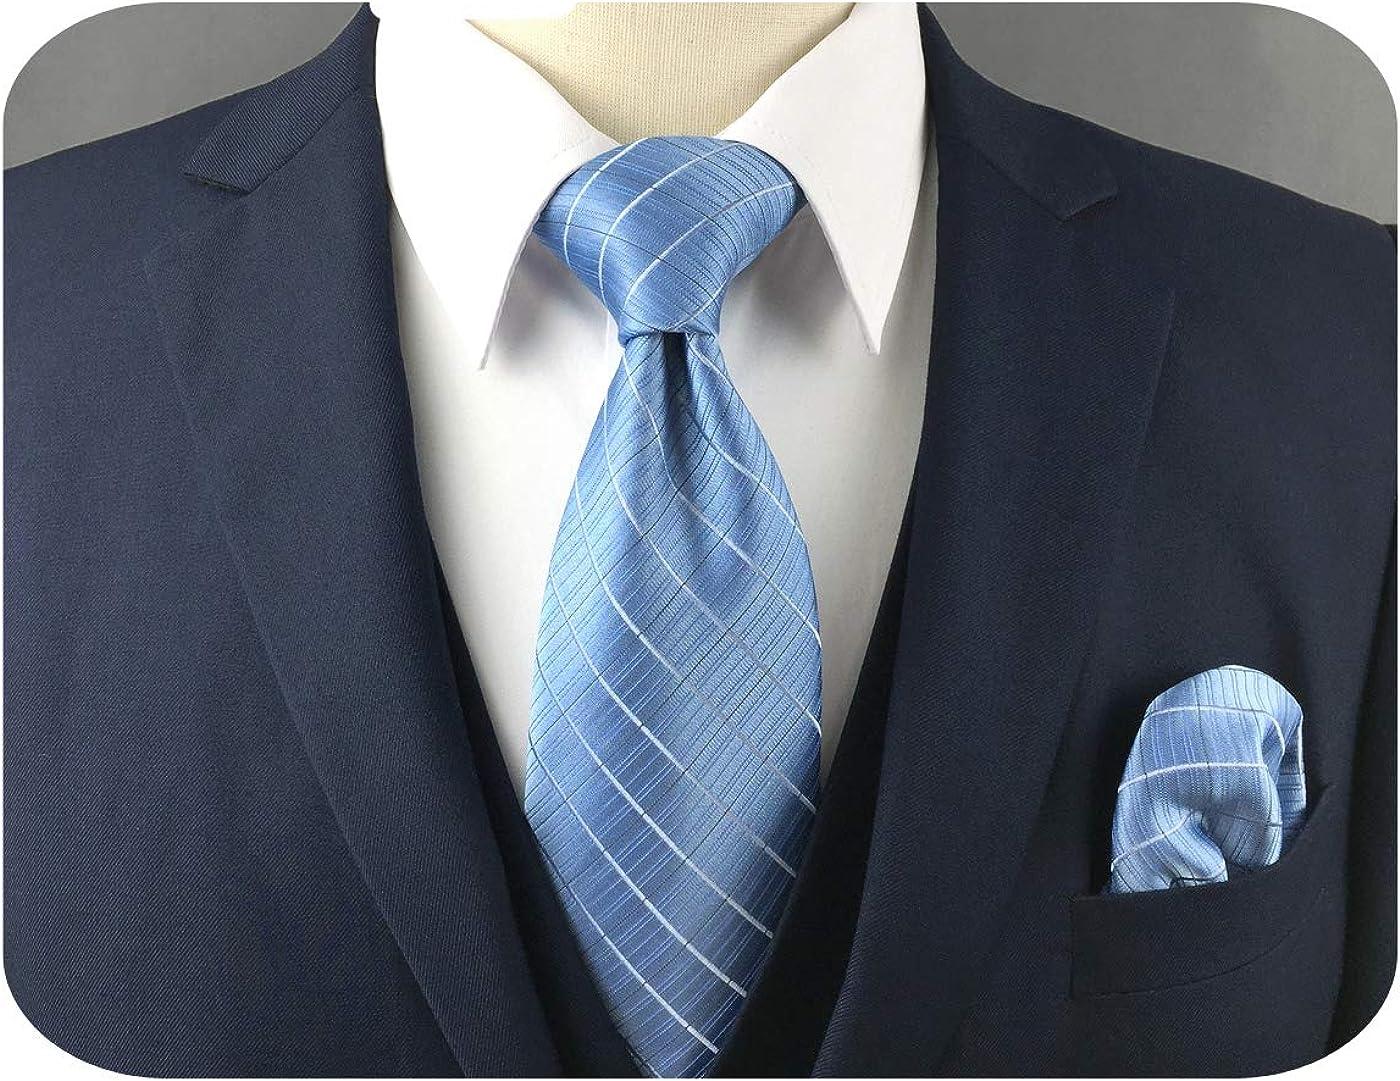 S&W SHLAX&WING Mens Ties Slate Blue Men Necktie Set Plaid